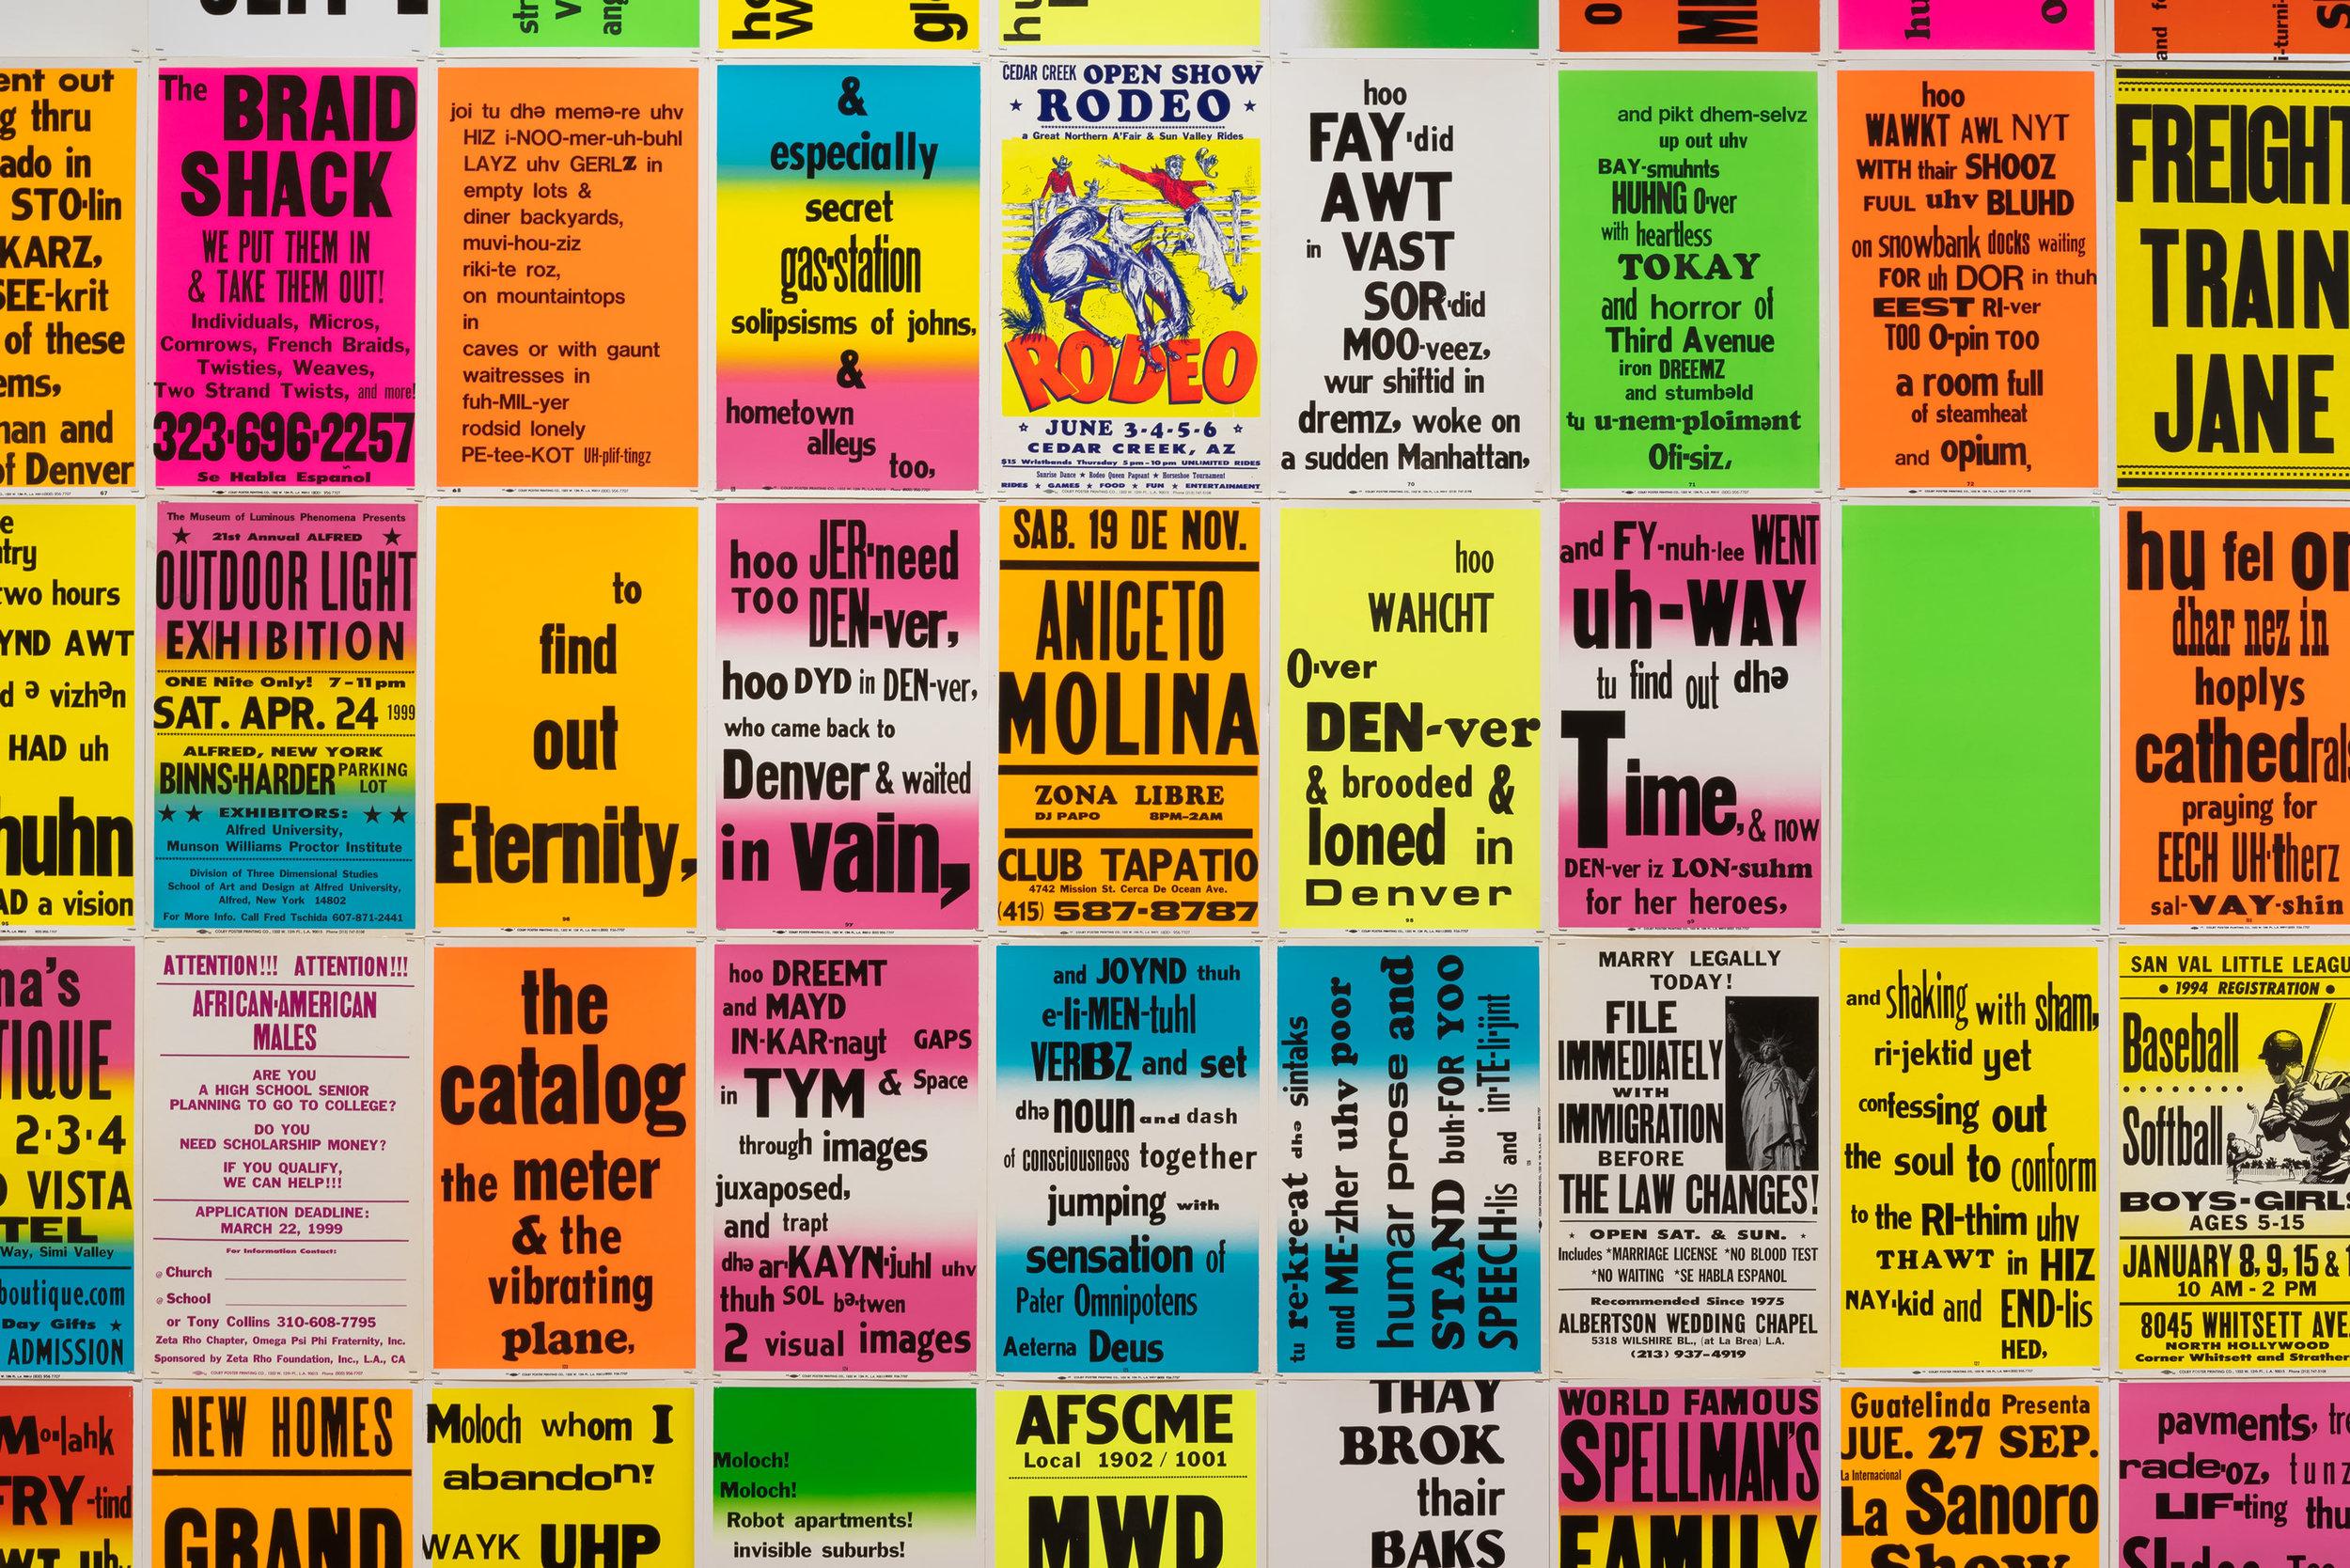 Allen Ruppersberg: Intellectual Property 1968–2018, art exhibit @ Hammer Museum // photo source: hammer.ucla.edu